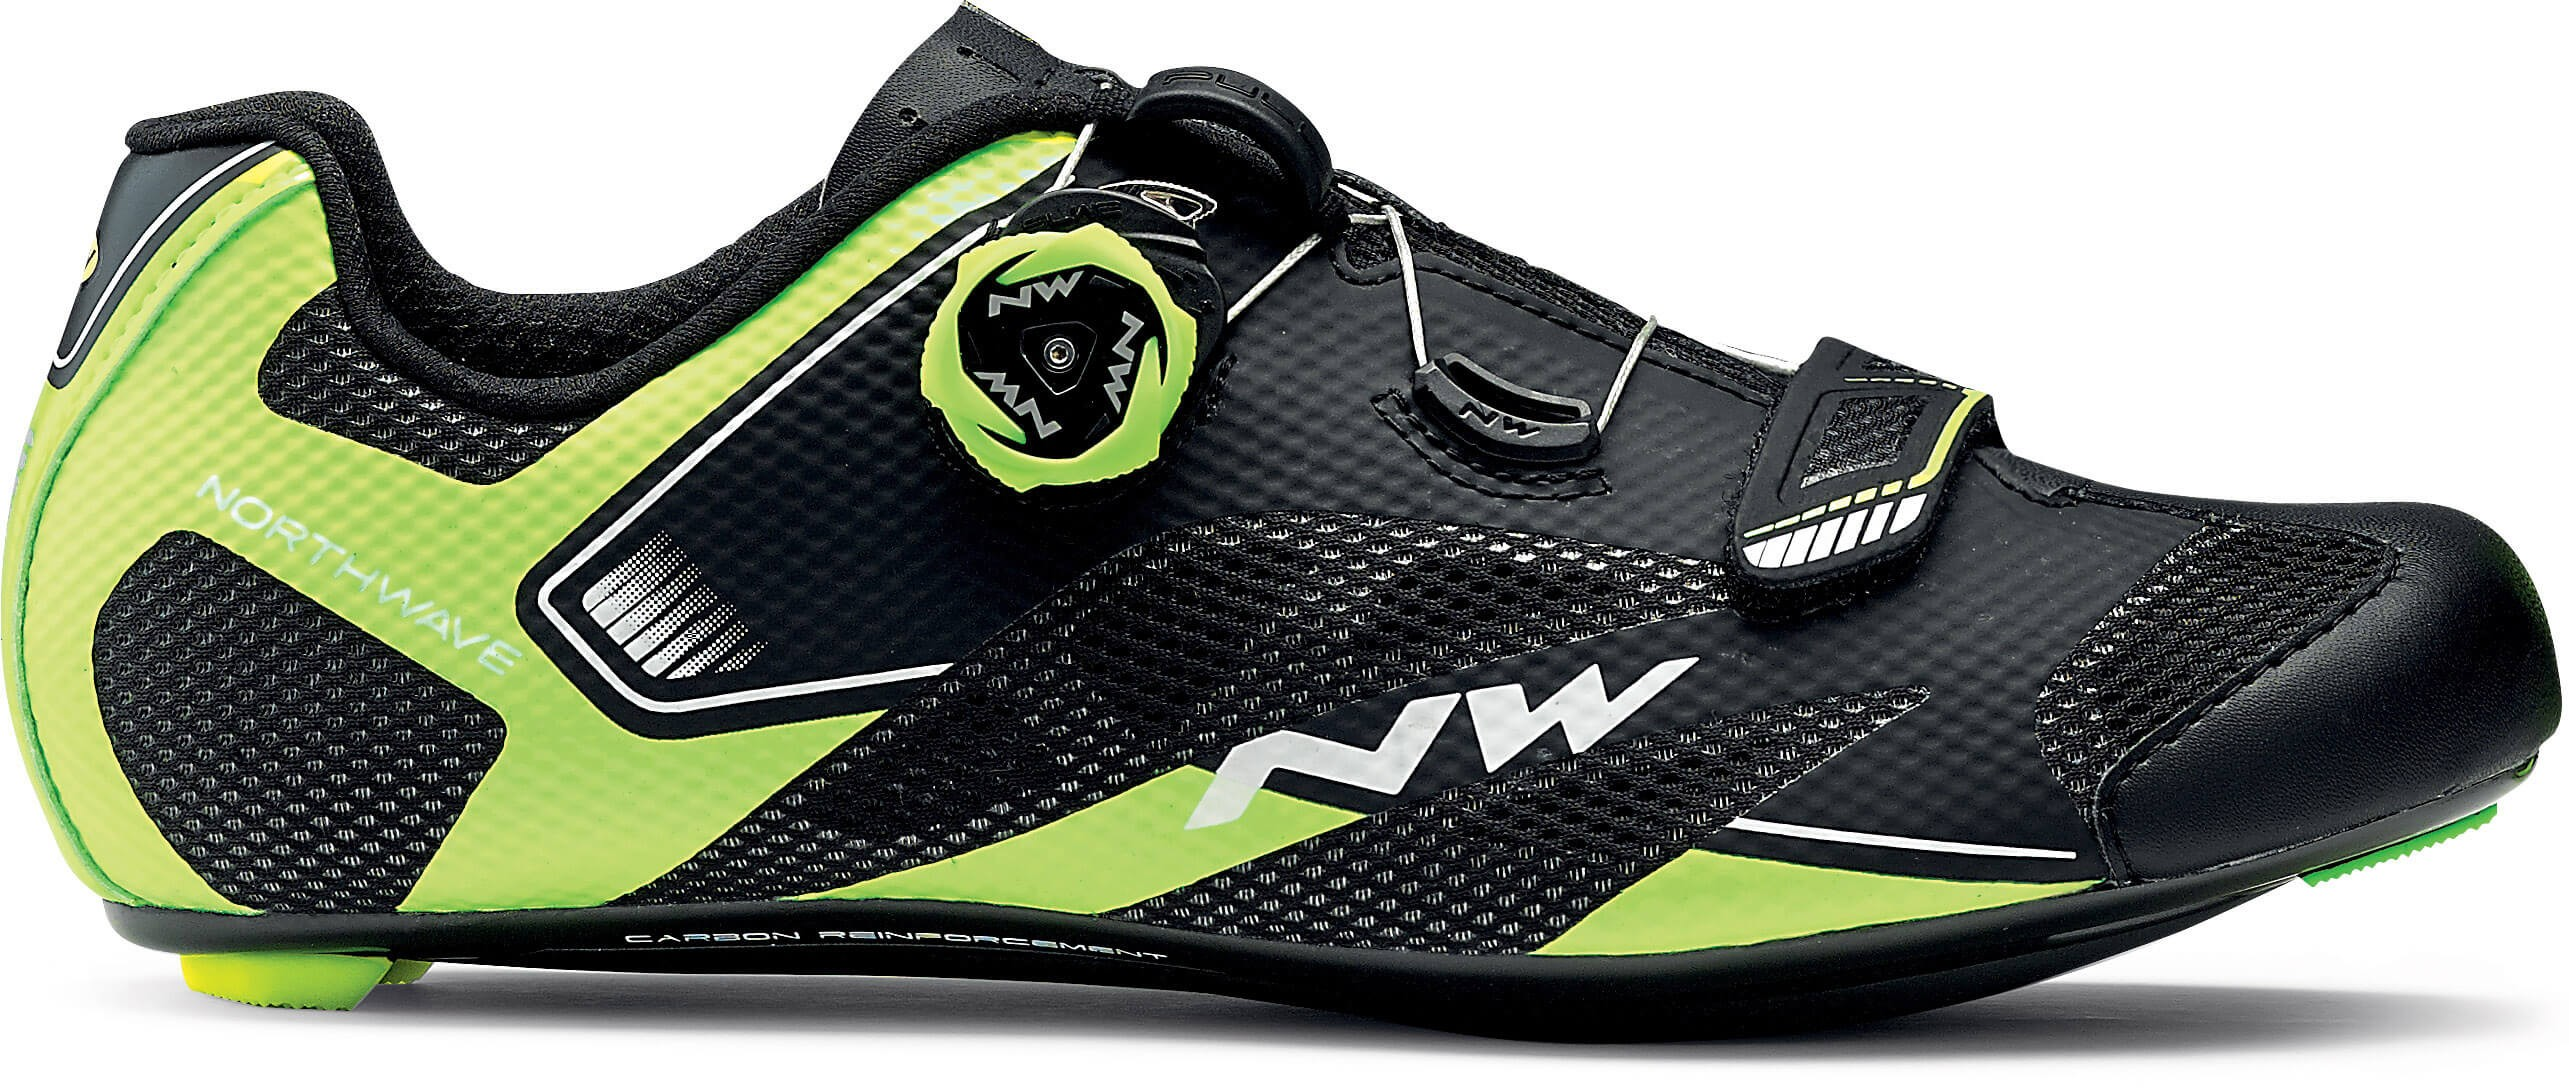 Northwave sonic 2 plus chaussures route noir jaune blanc